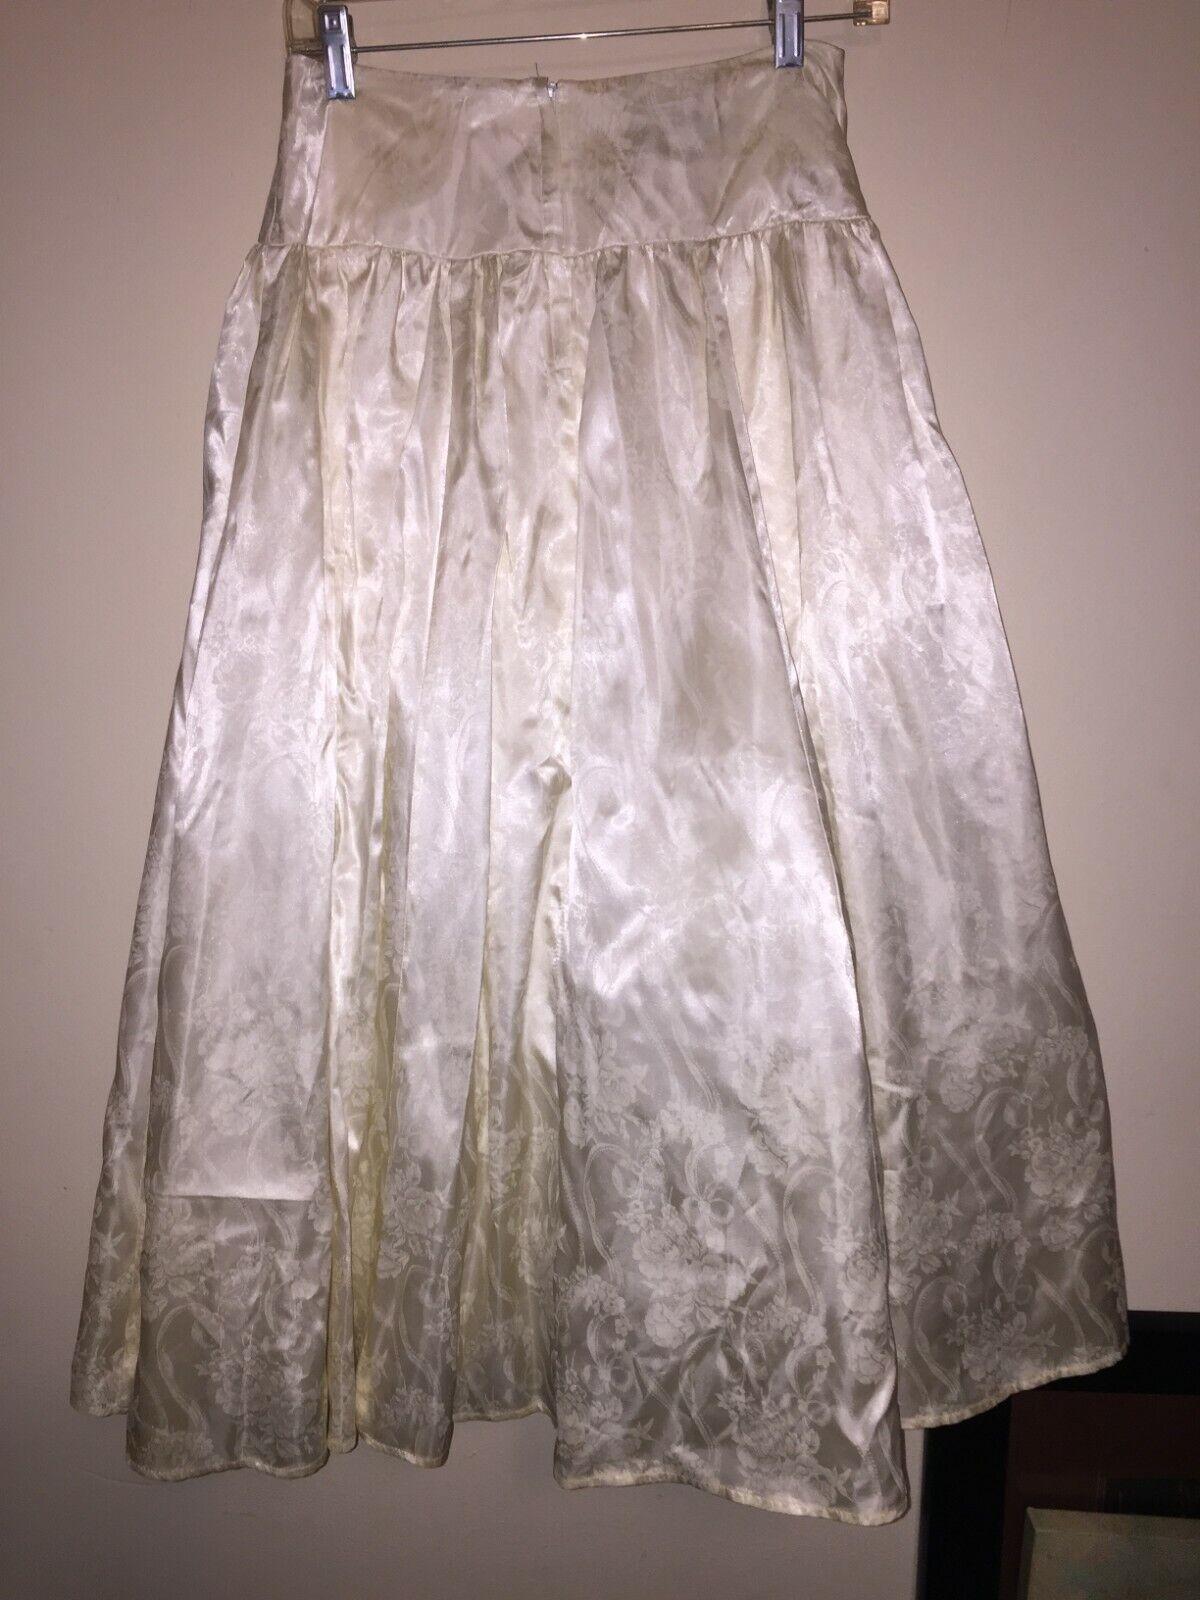 VINTAGE Jessica McClintock Crinoline Skirt 80s - image 4